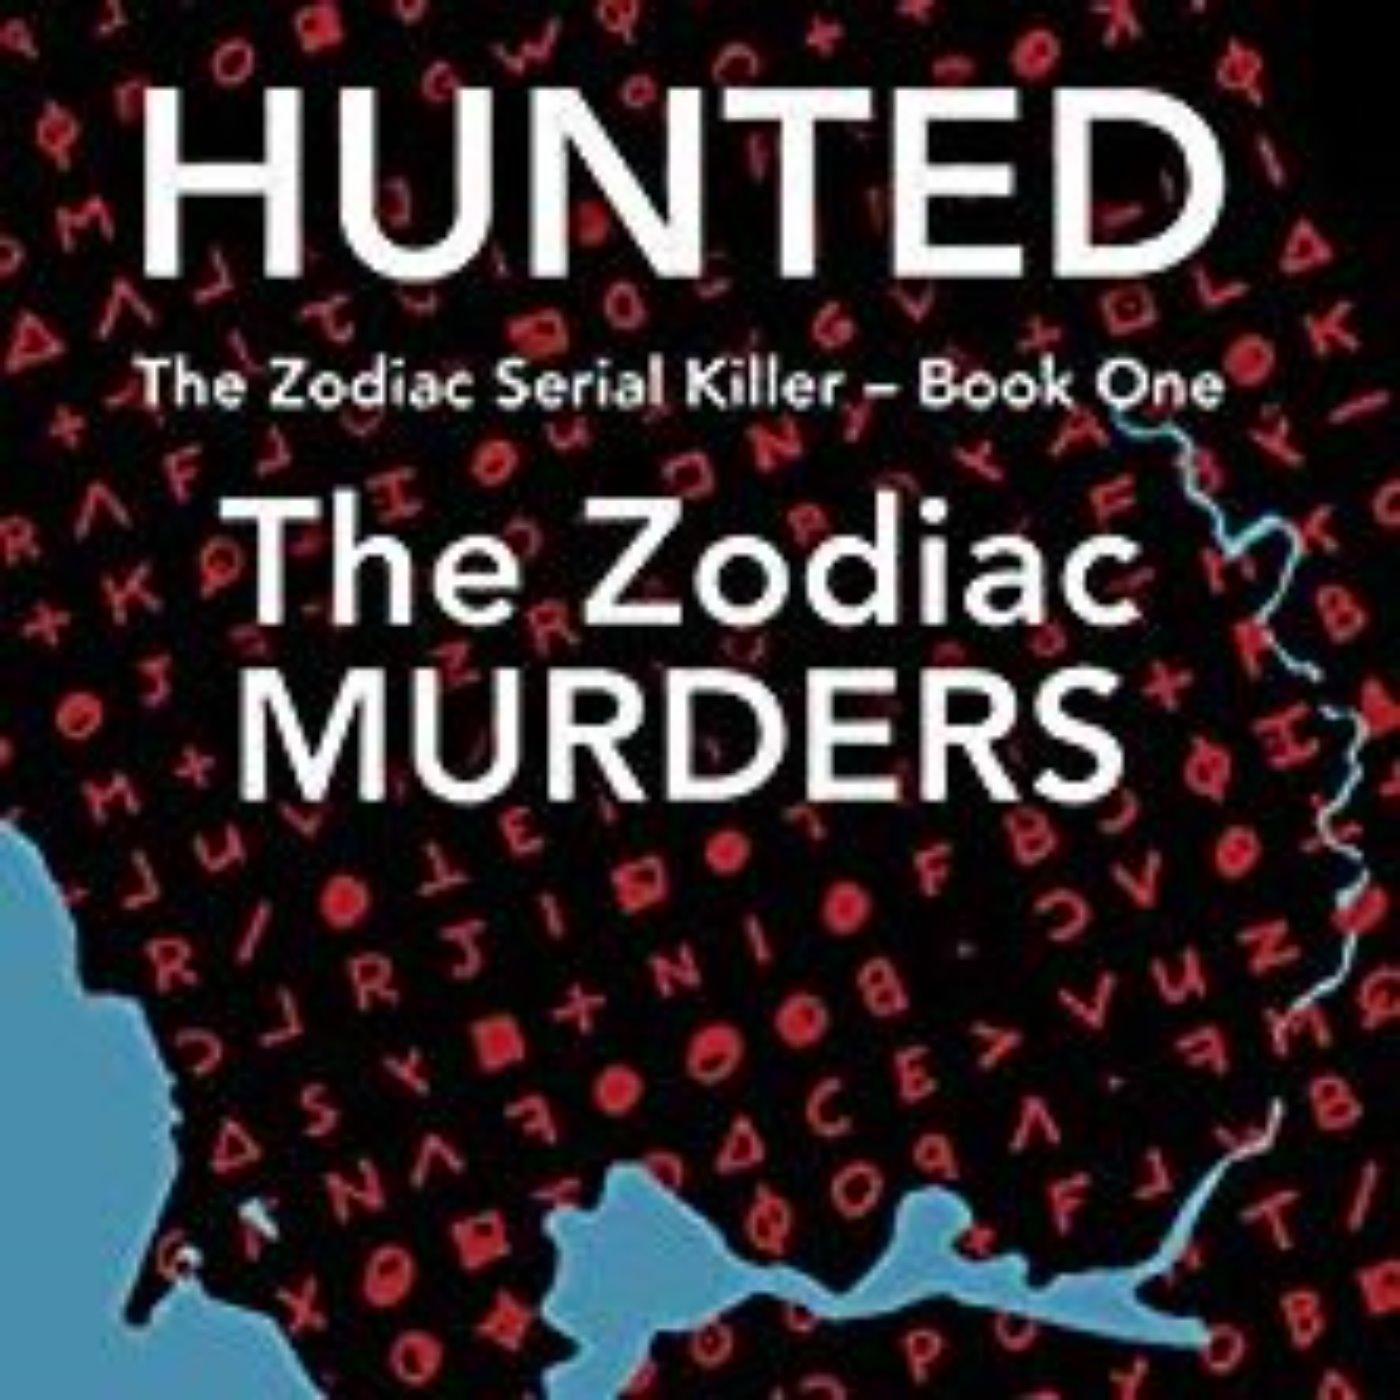 HUNTED the ZODIAC MURDERS - MARK G HEWITT